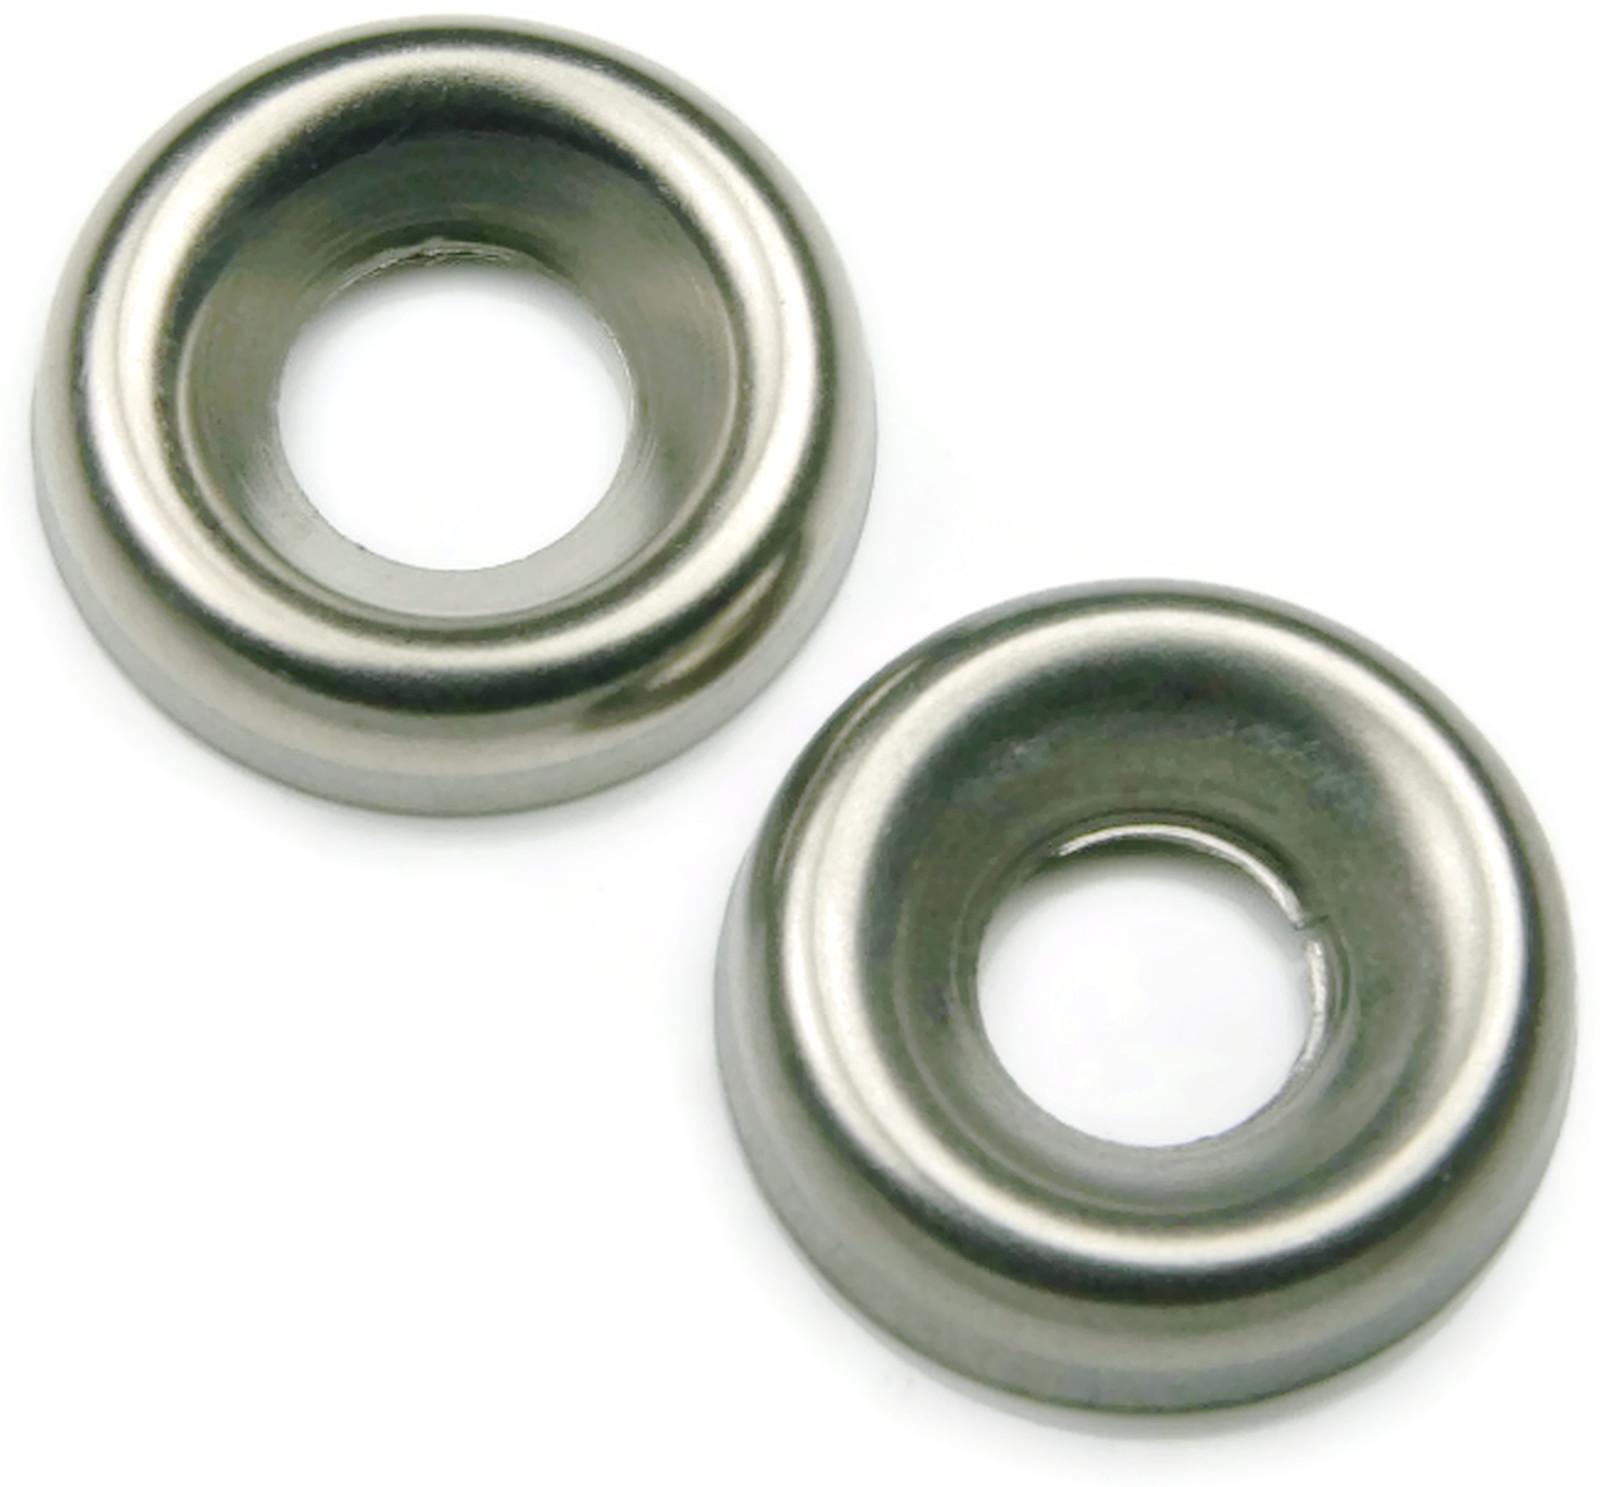 Stainless Steel Finishing Cup Washer 1/4, Qty 100代拍_海外代购 ...